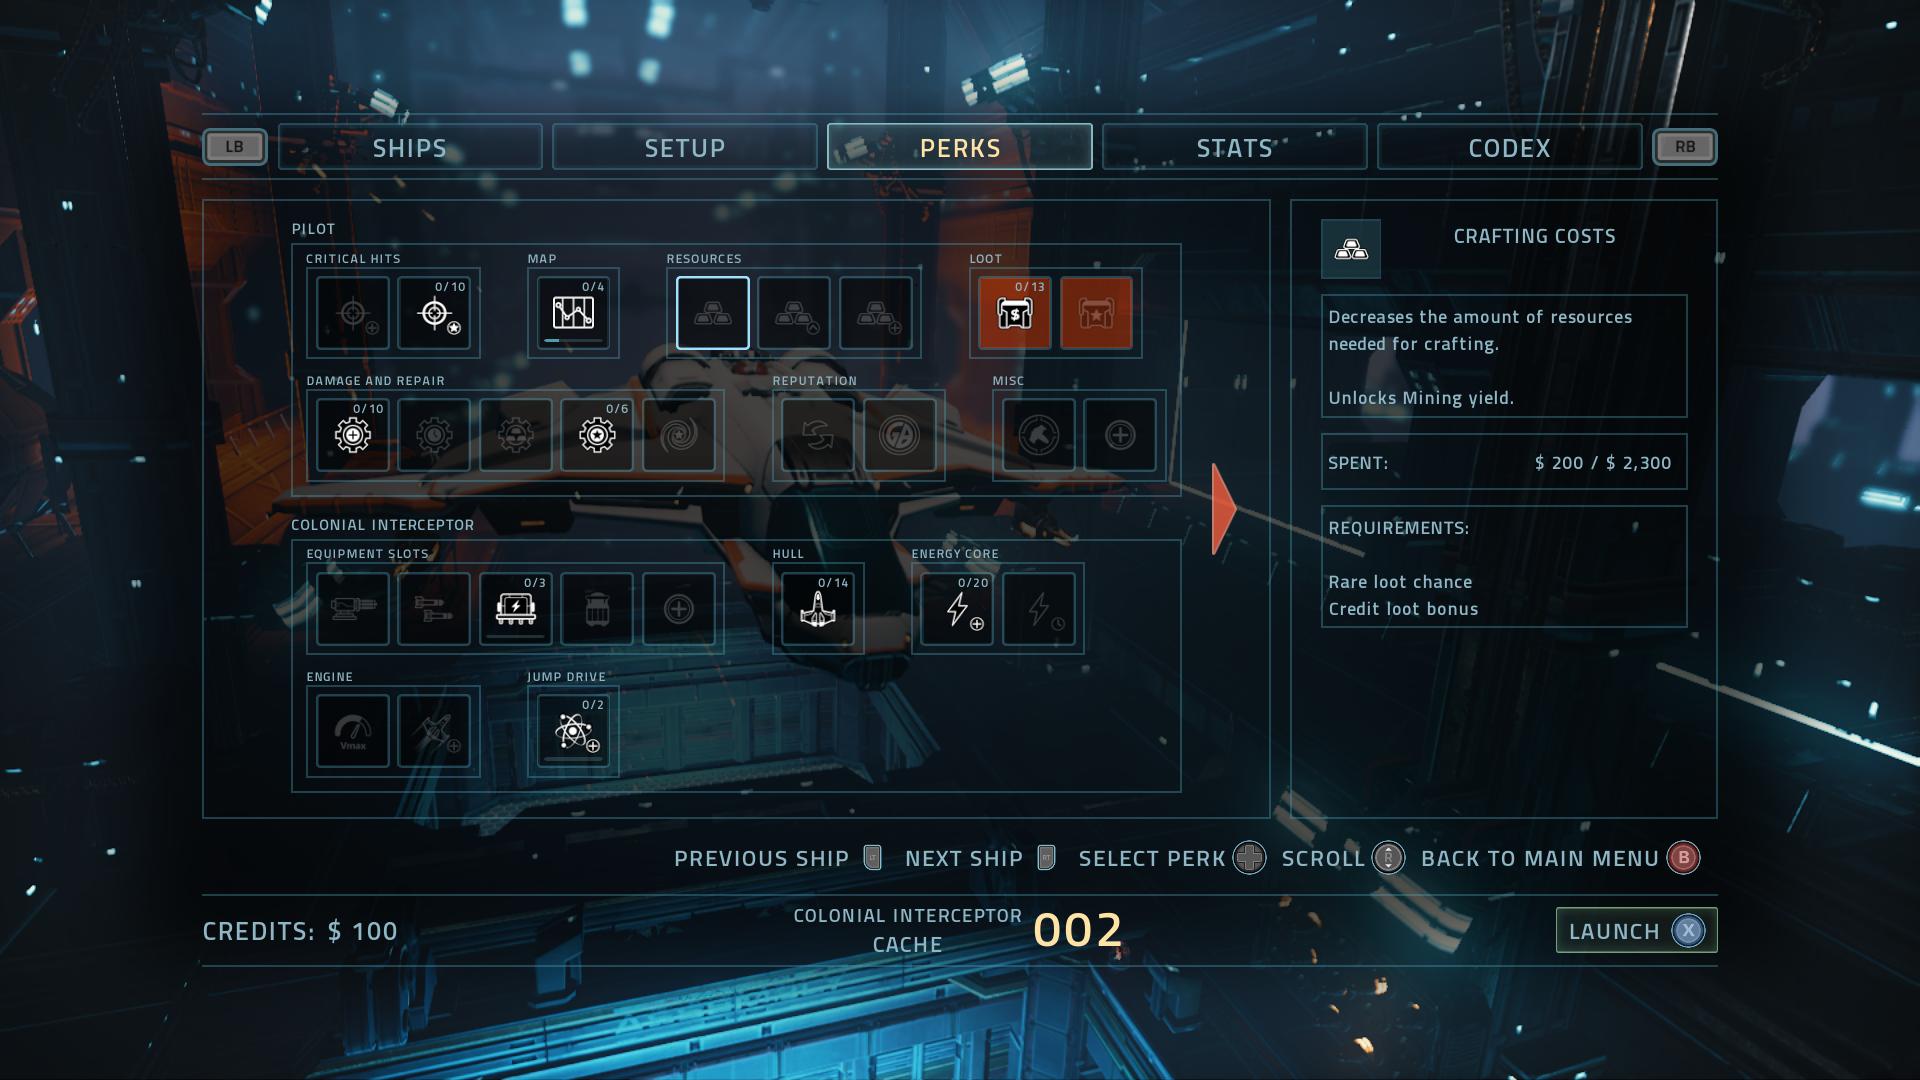 Ship Upgrades